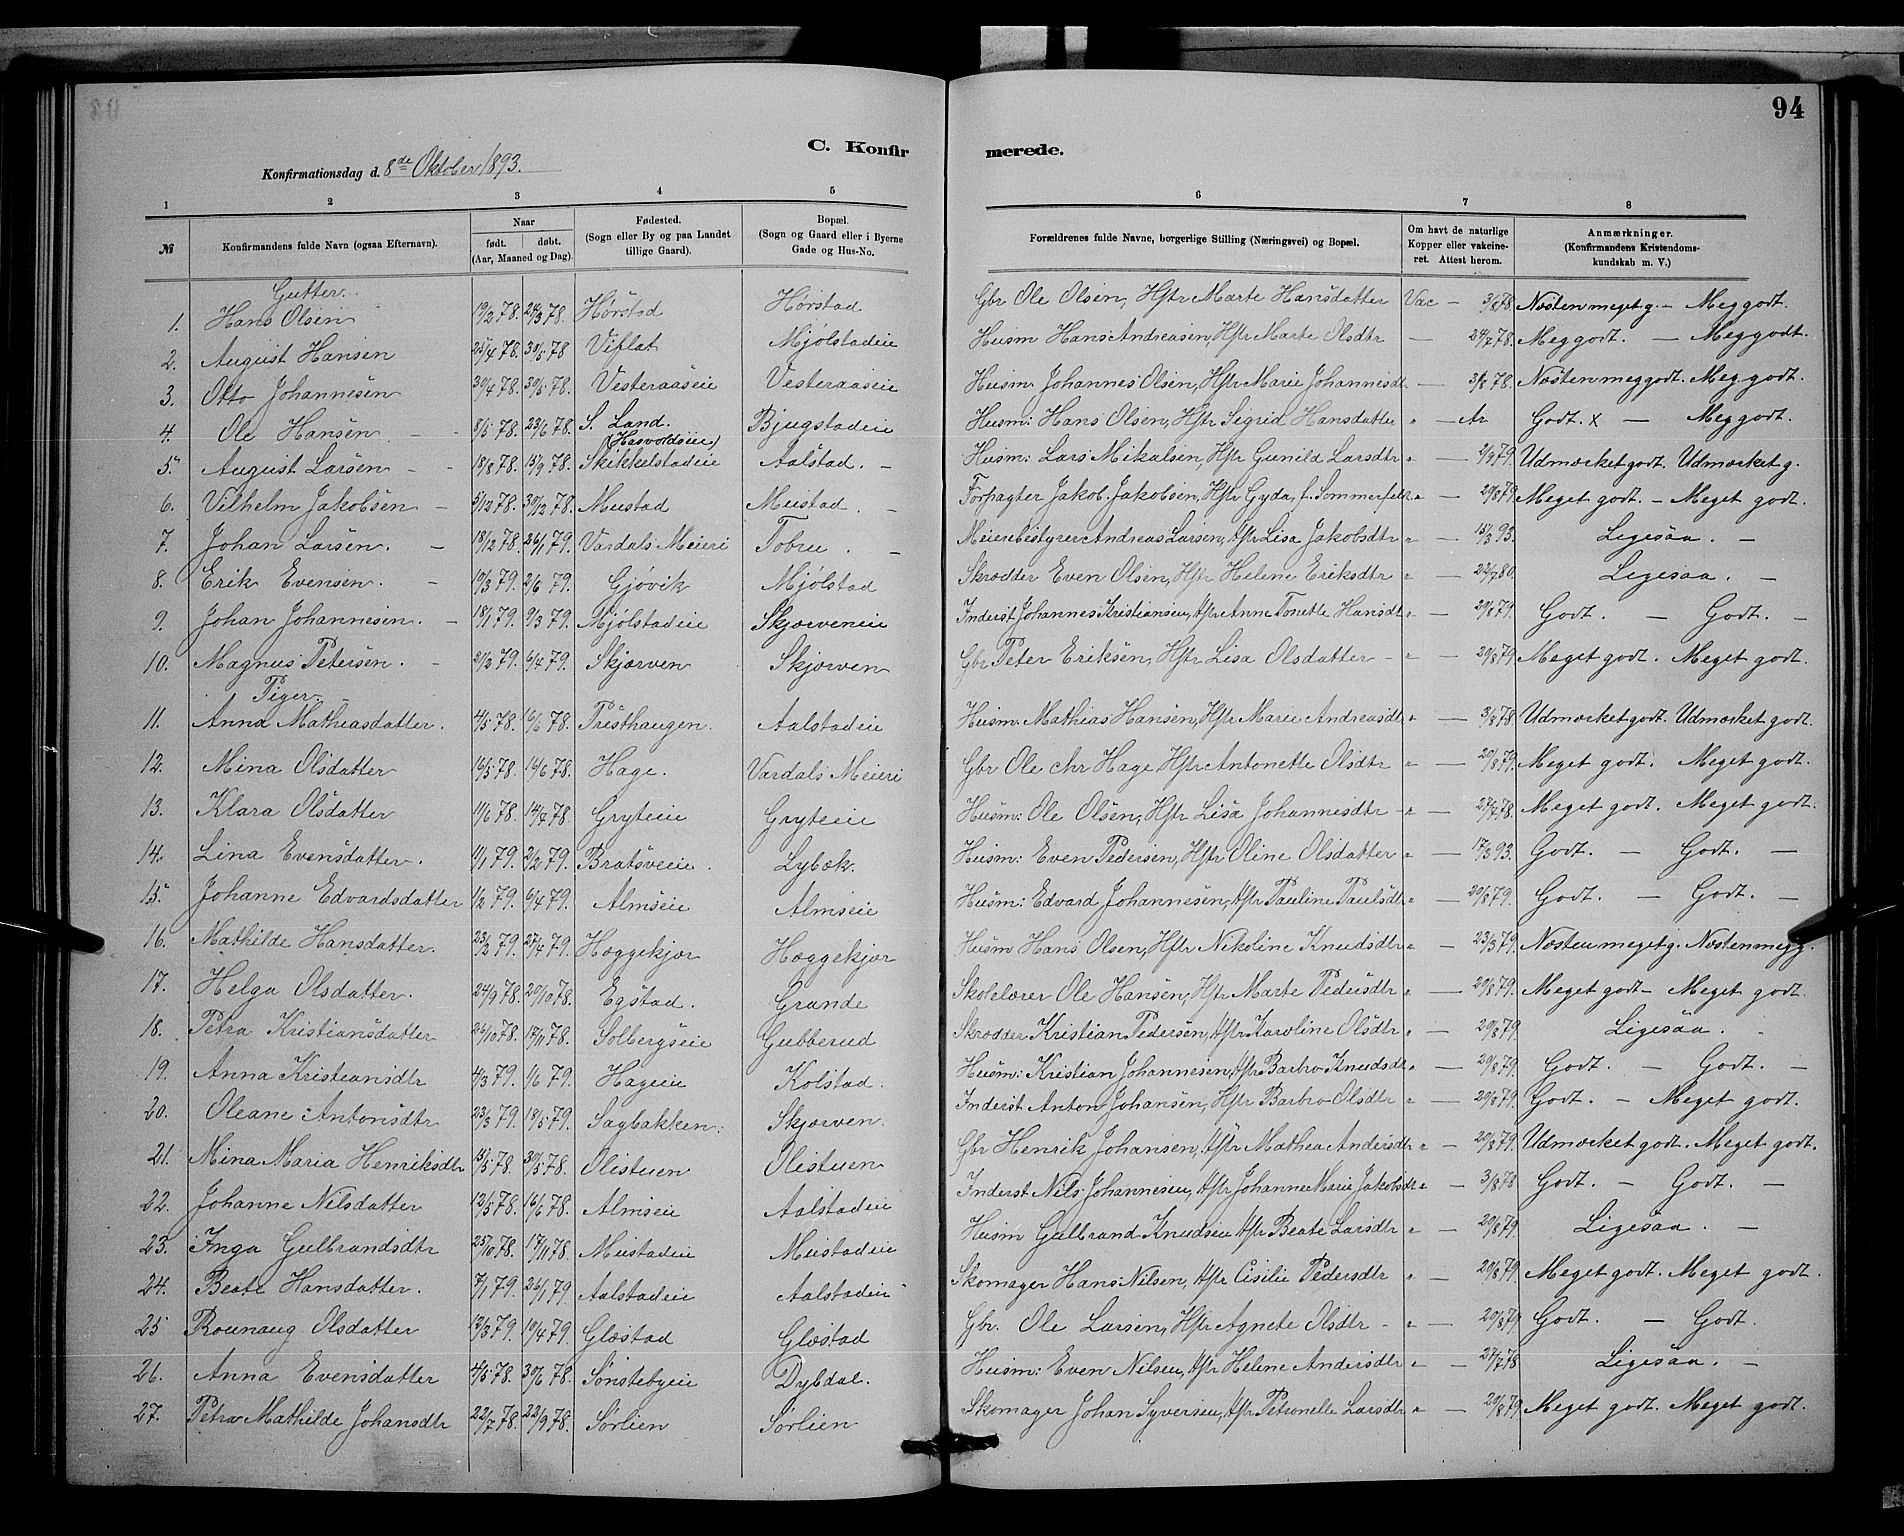 SAH, Vardal prestekontor, H/Ha/Hab/L0008: Klokkerbok nr. 8, 1881-1898, s. 94